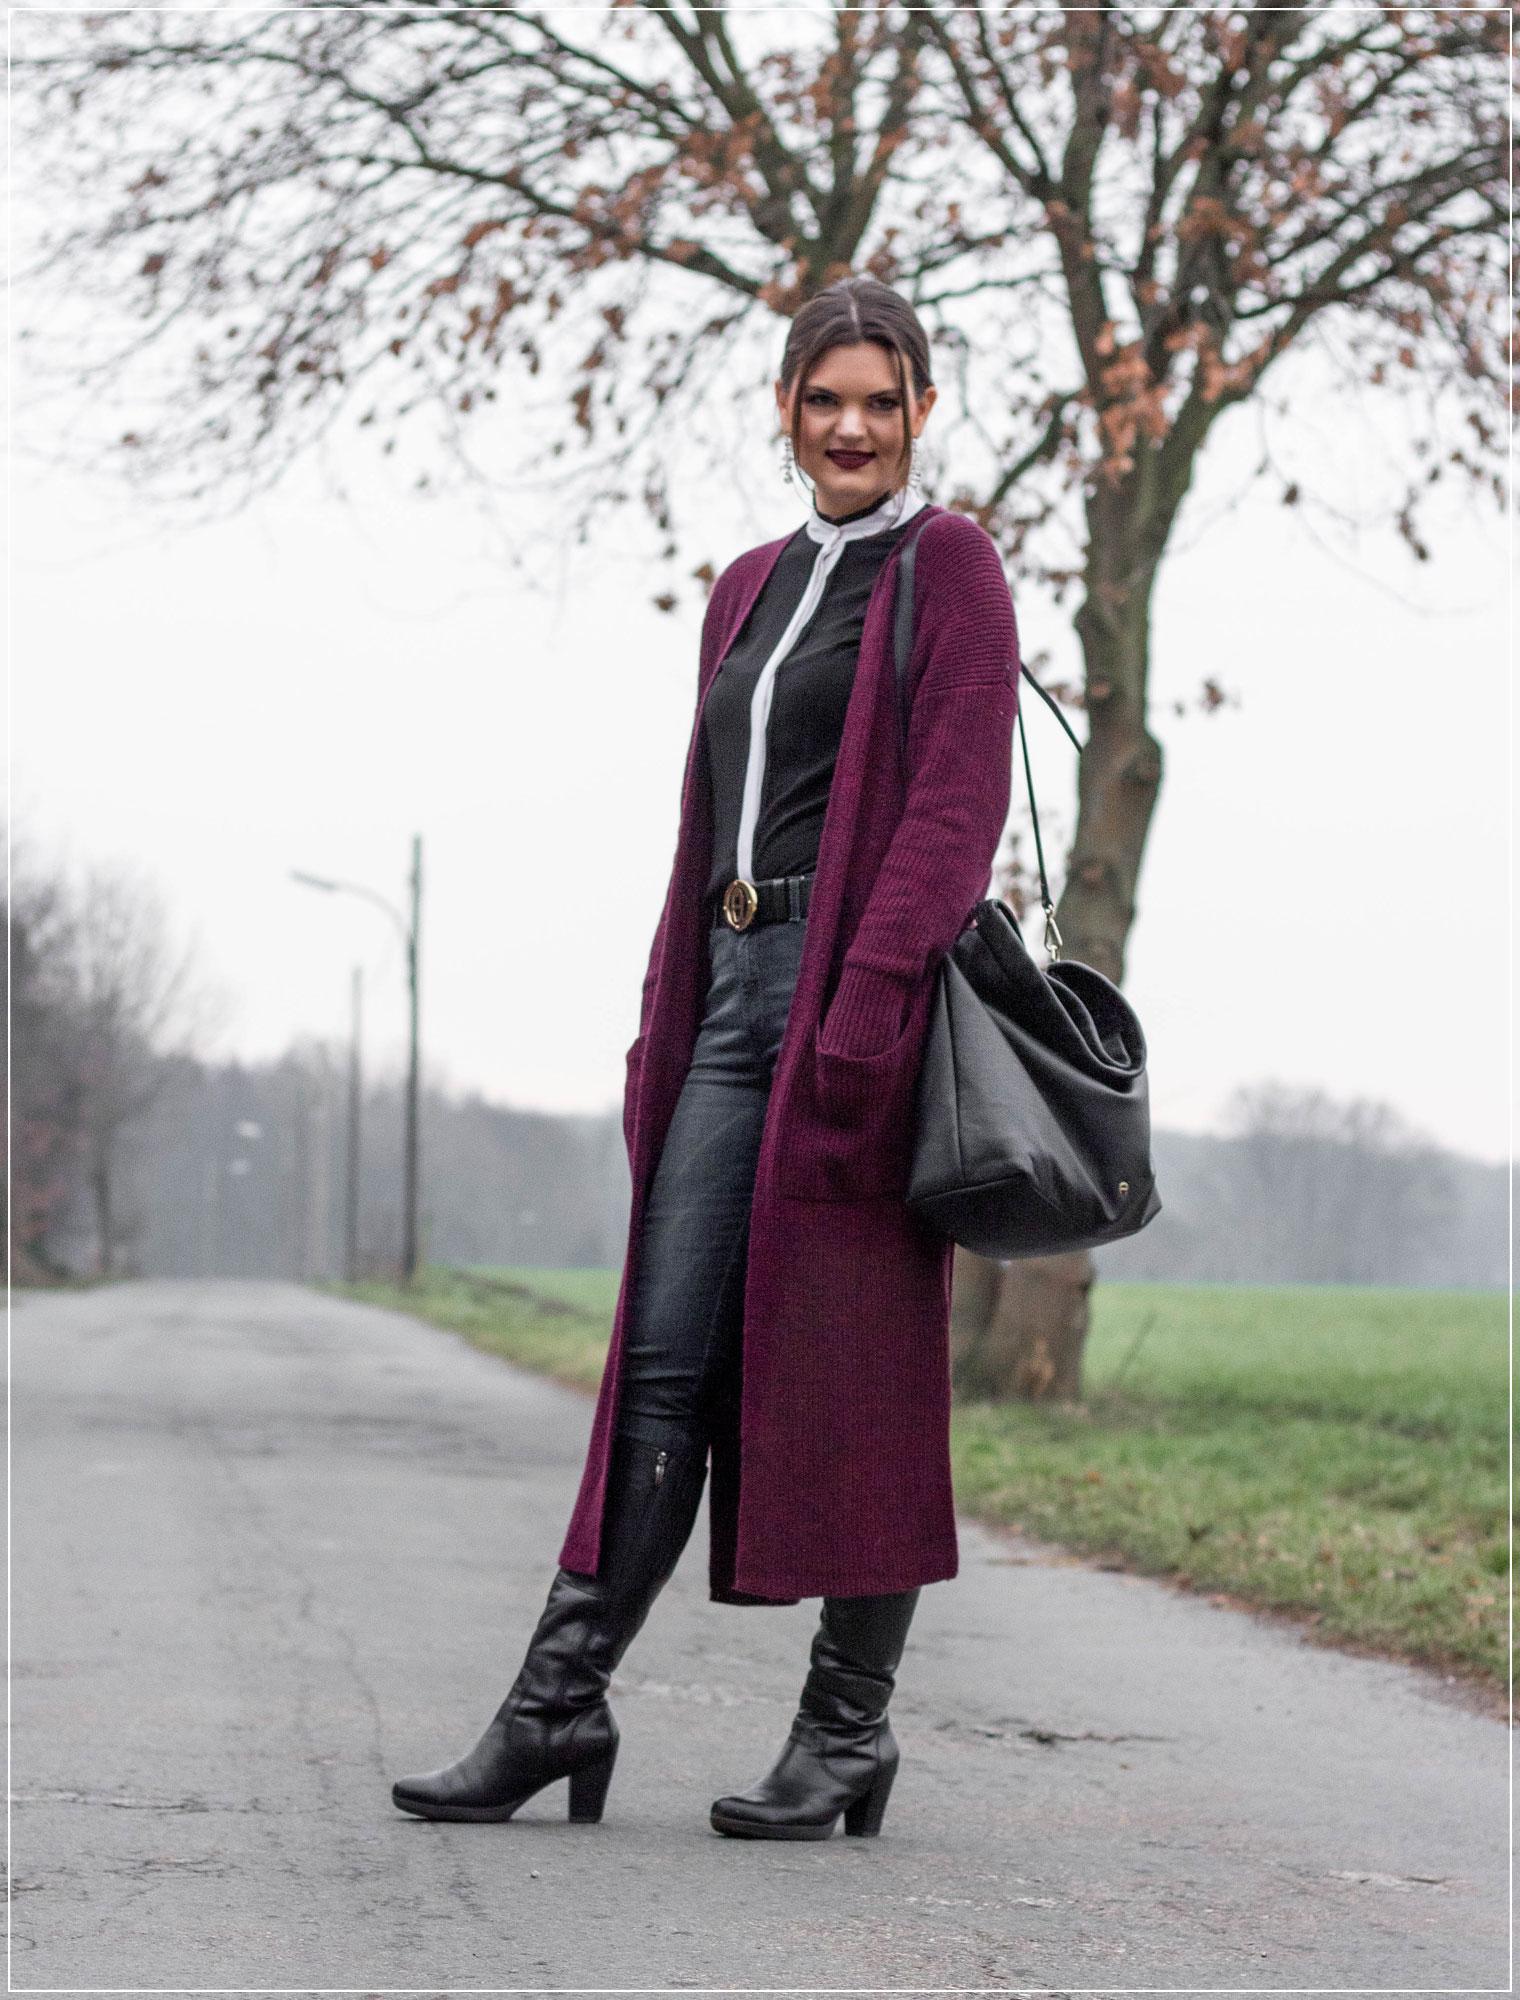 Strickmantel, Bürolook, Jeanslook, Winterlook, Outfitinspiration, Bloggeroutfit, Longcardigan, Outfitinspiration, Winterstyle, Alltagslook, Modebloggerin, Fashionbloggerin, Modeblog, Ruhrgebiet